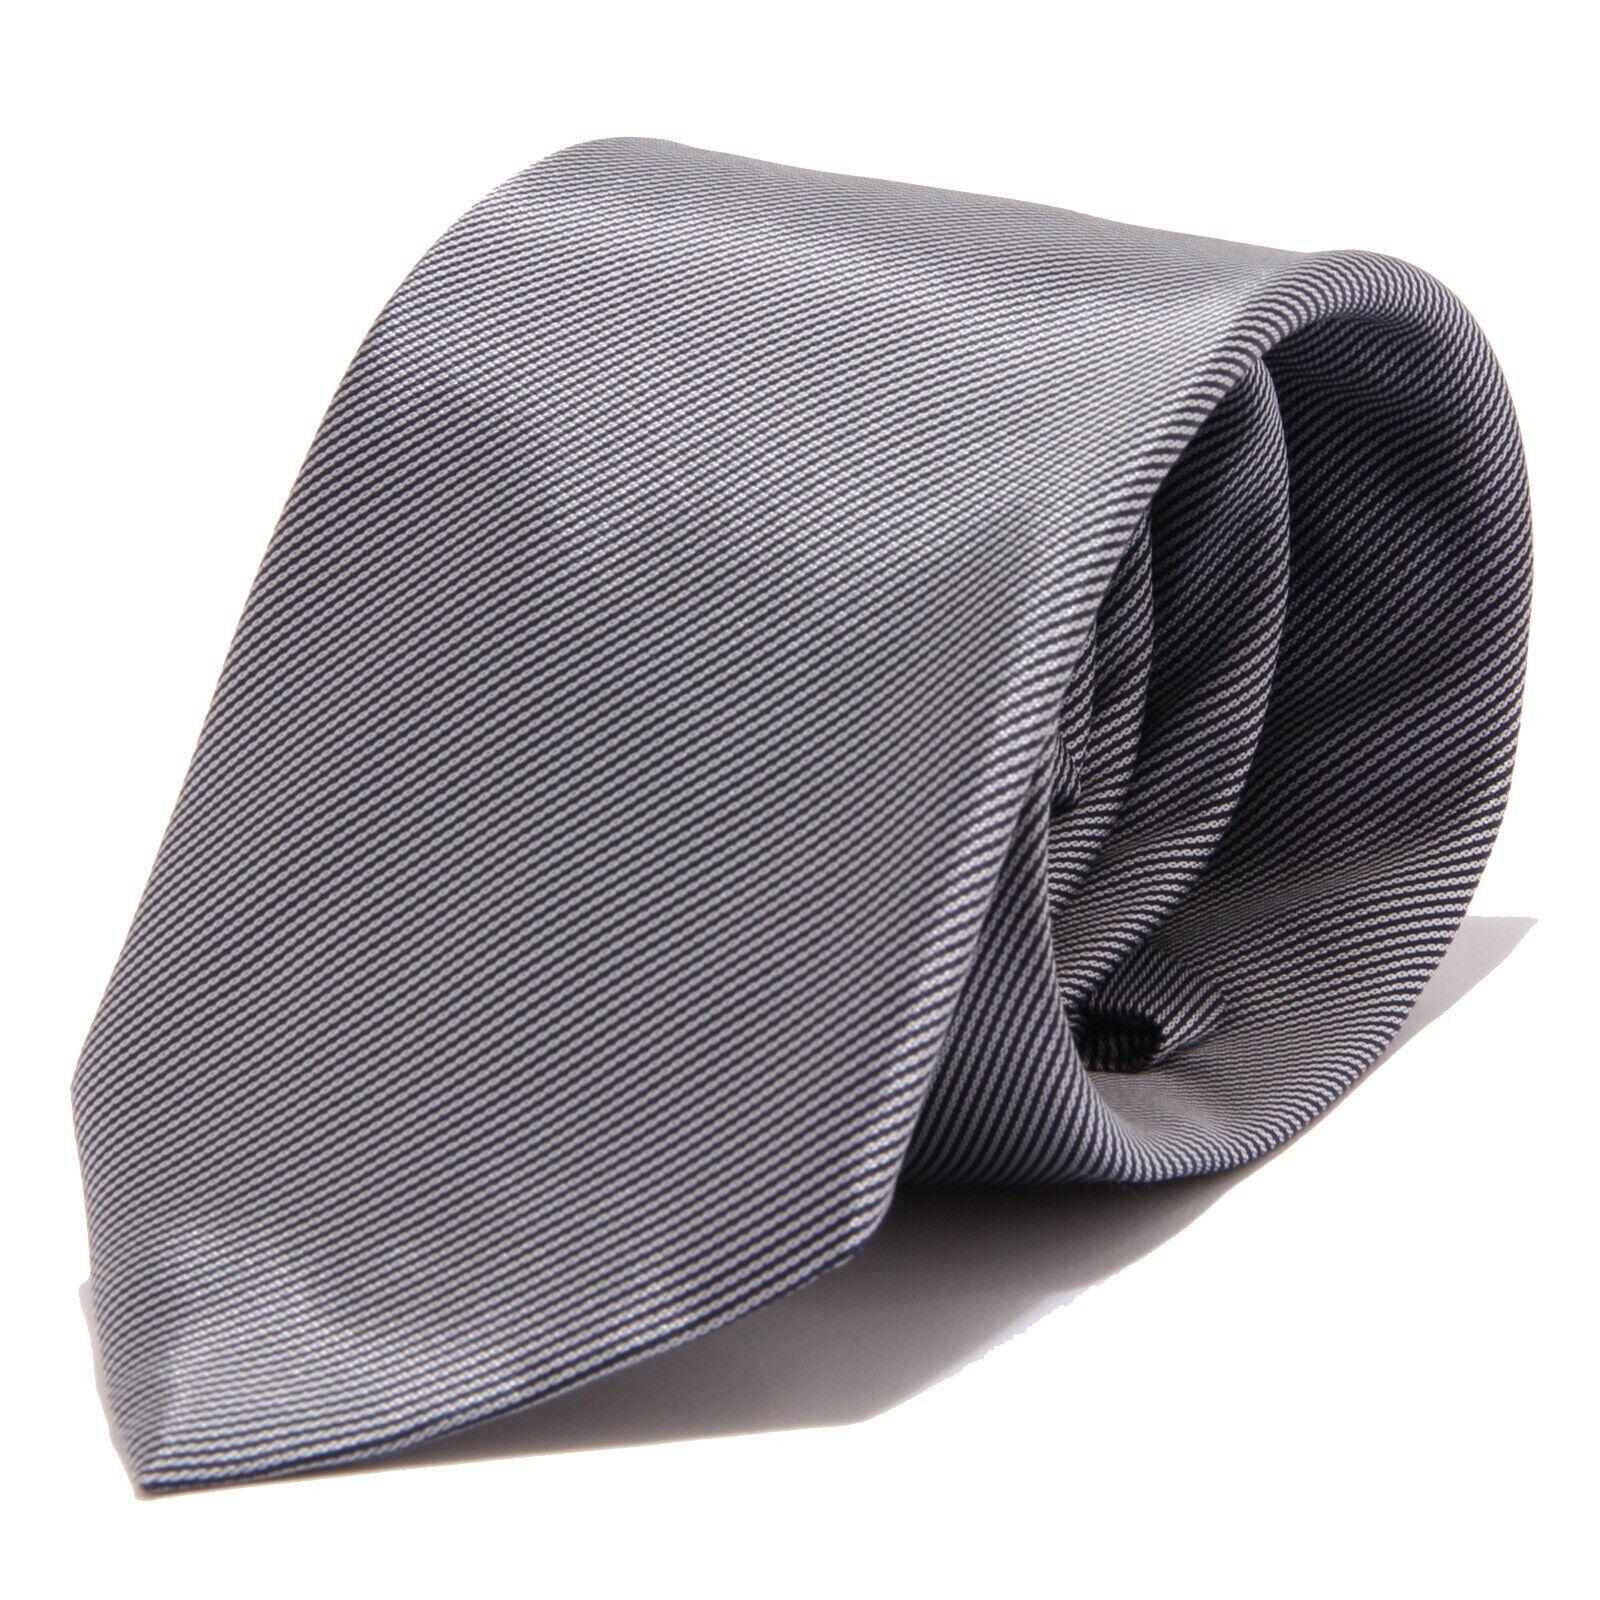 9341J (no label) CRAVATTA uomo no Brand Silver/Black Stripes Silk Tie Men